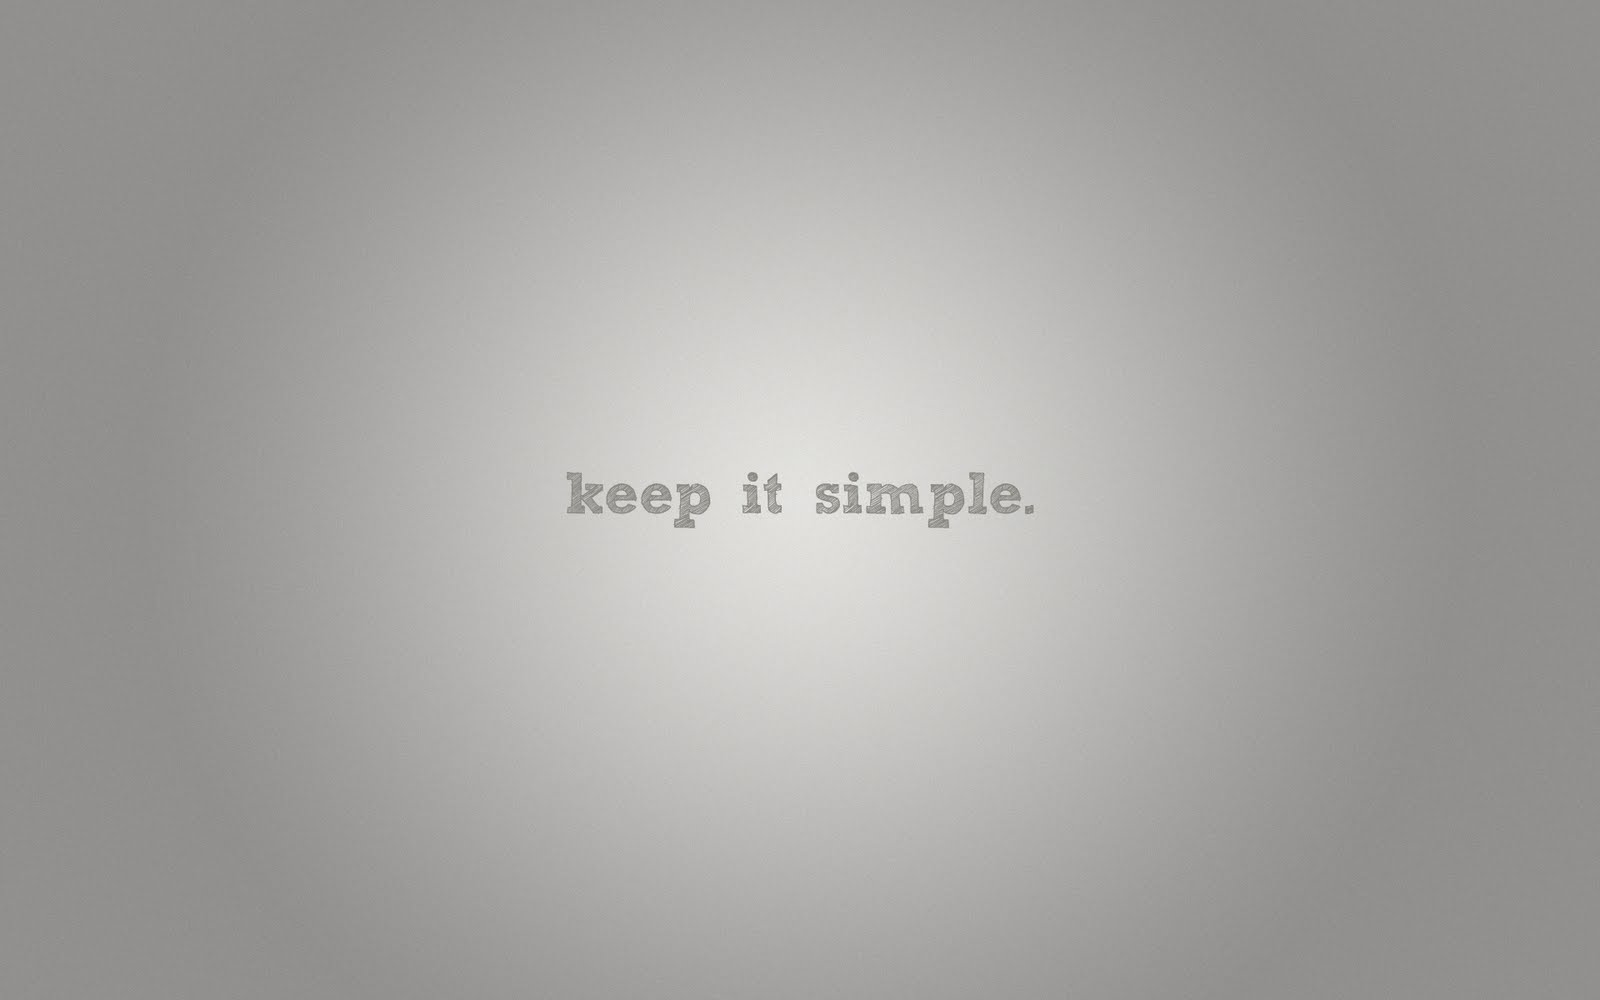 http://1.bp.blogspot.com/-doPqdnIYuro/TgUmffe1LaI/AAAAAAAAADs/B6KePOndMPs/s1600/1305065194003.jpg